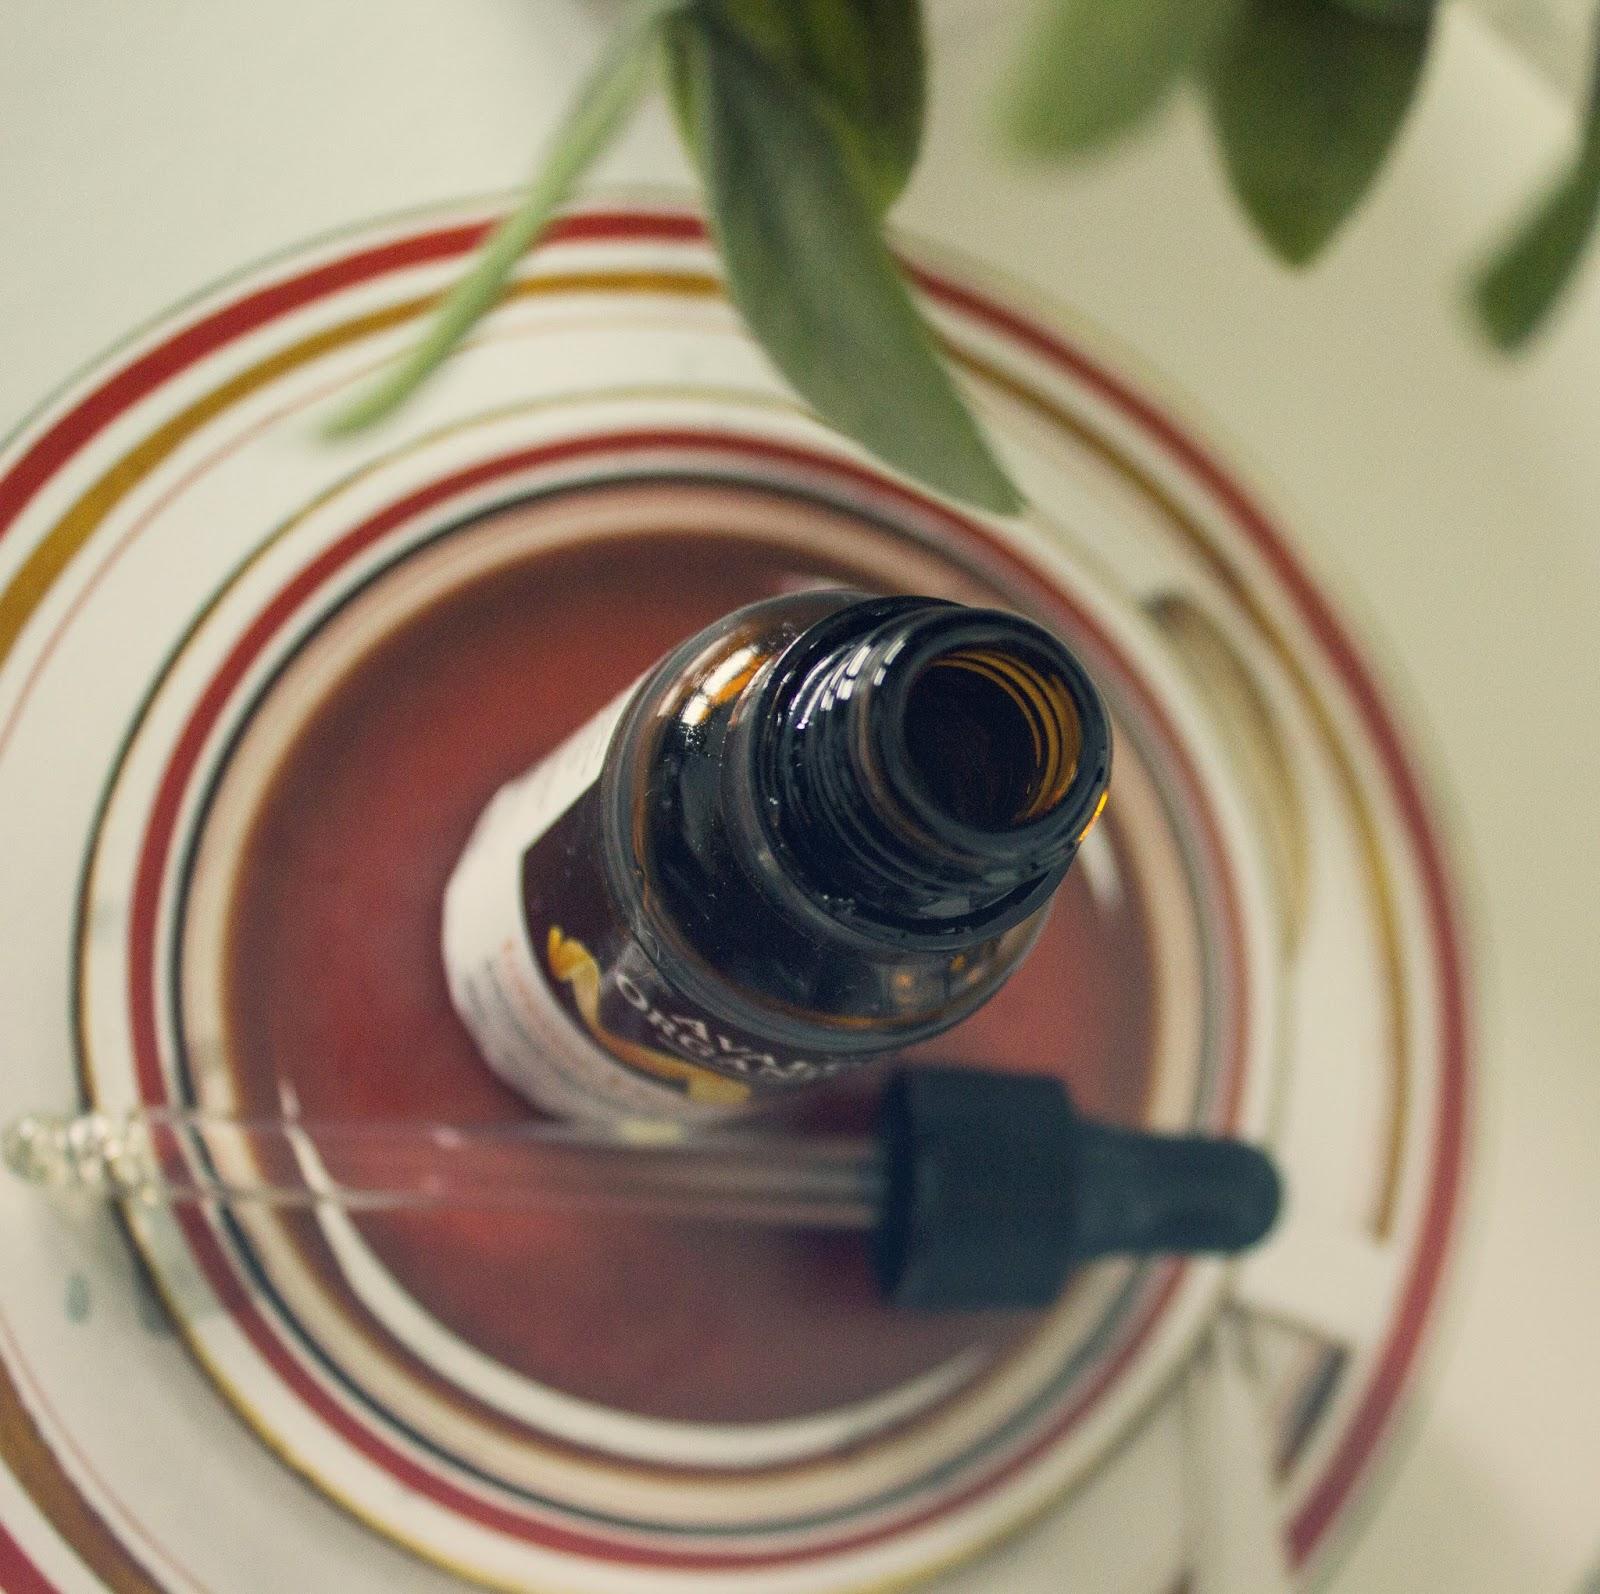 Avalon Organics, Intense Defense with Vitamin C, Antioxidant Oil